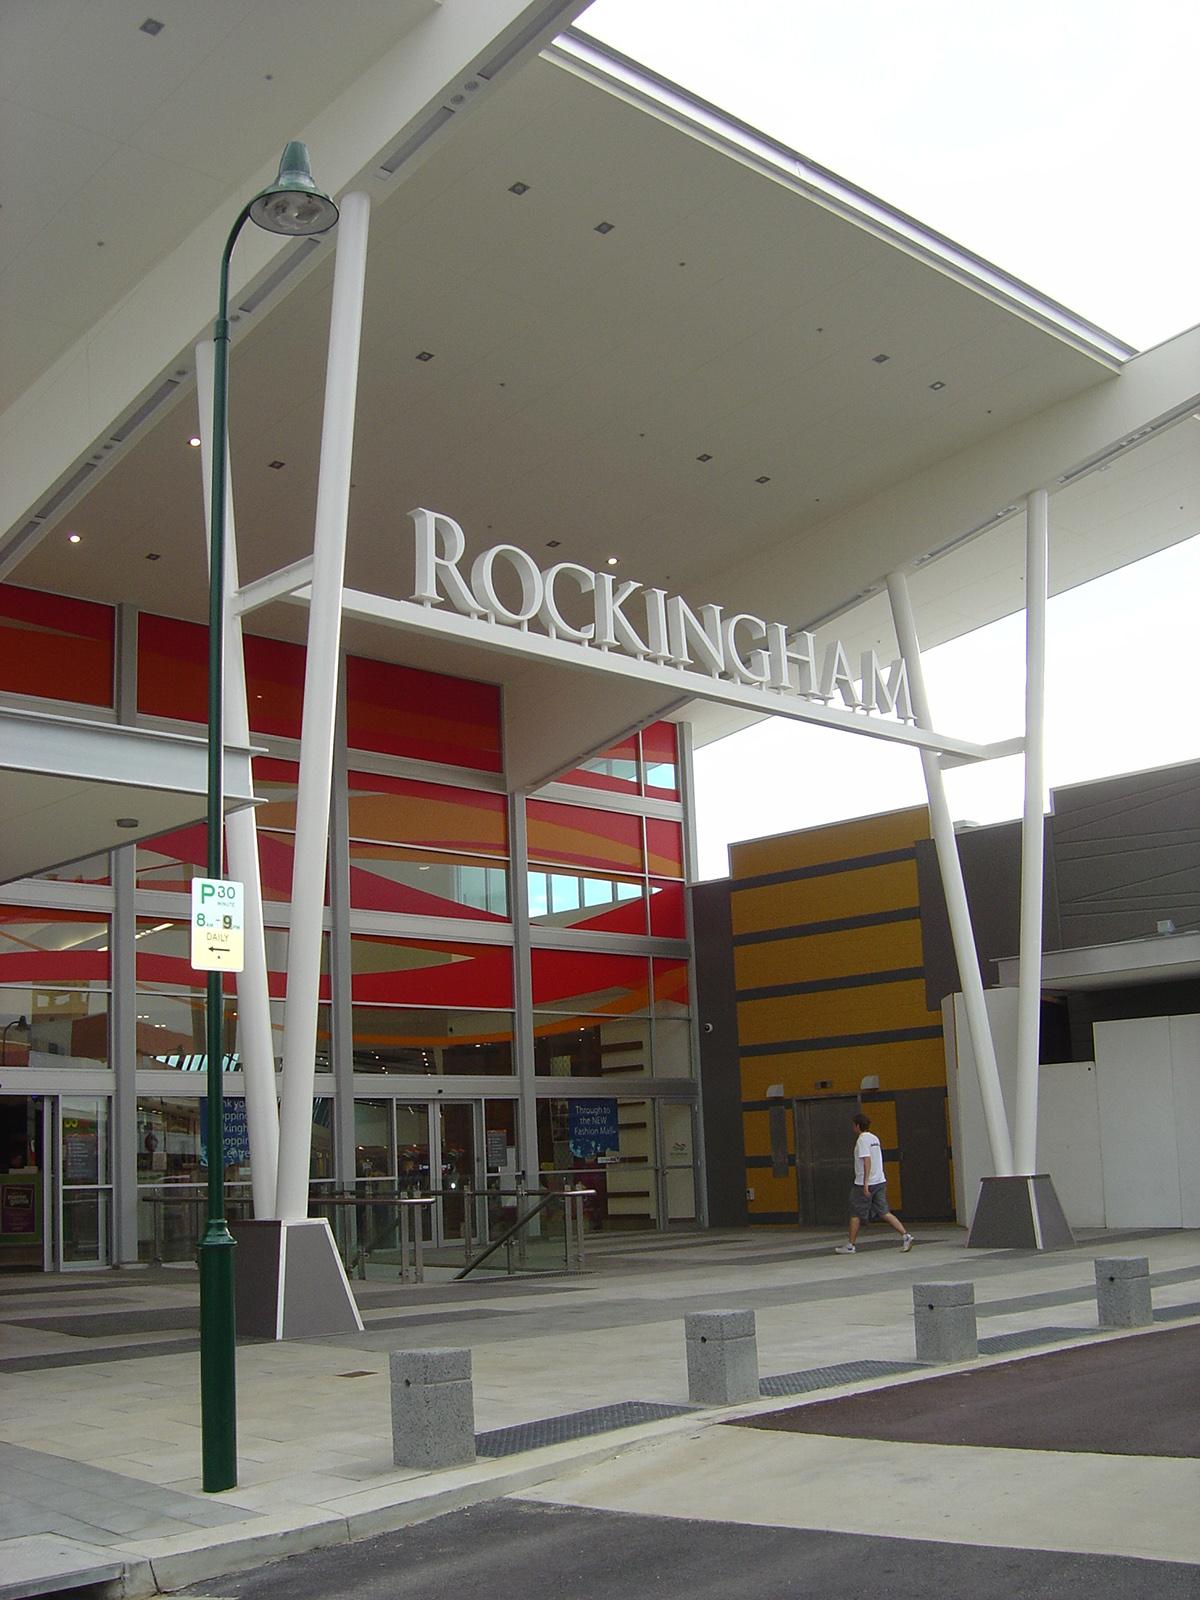 04-Rockingham 08-09-015